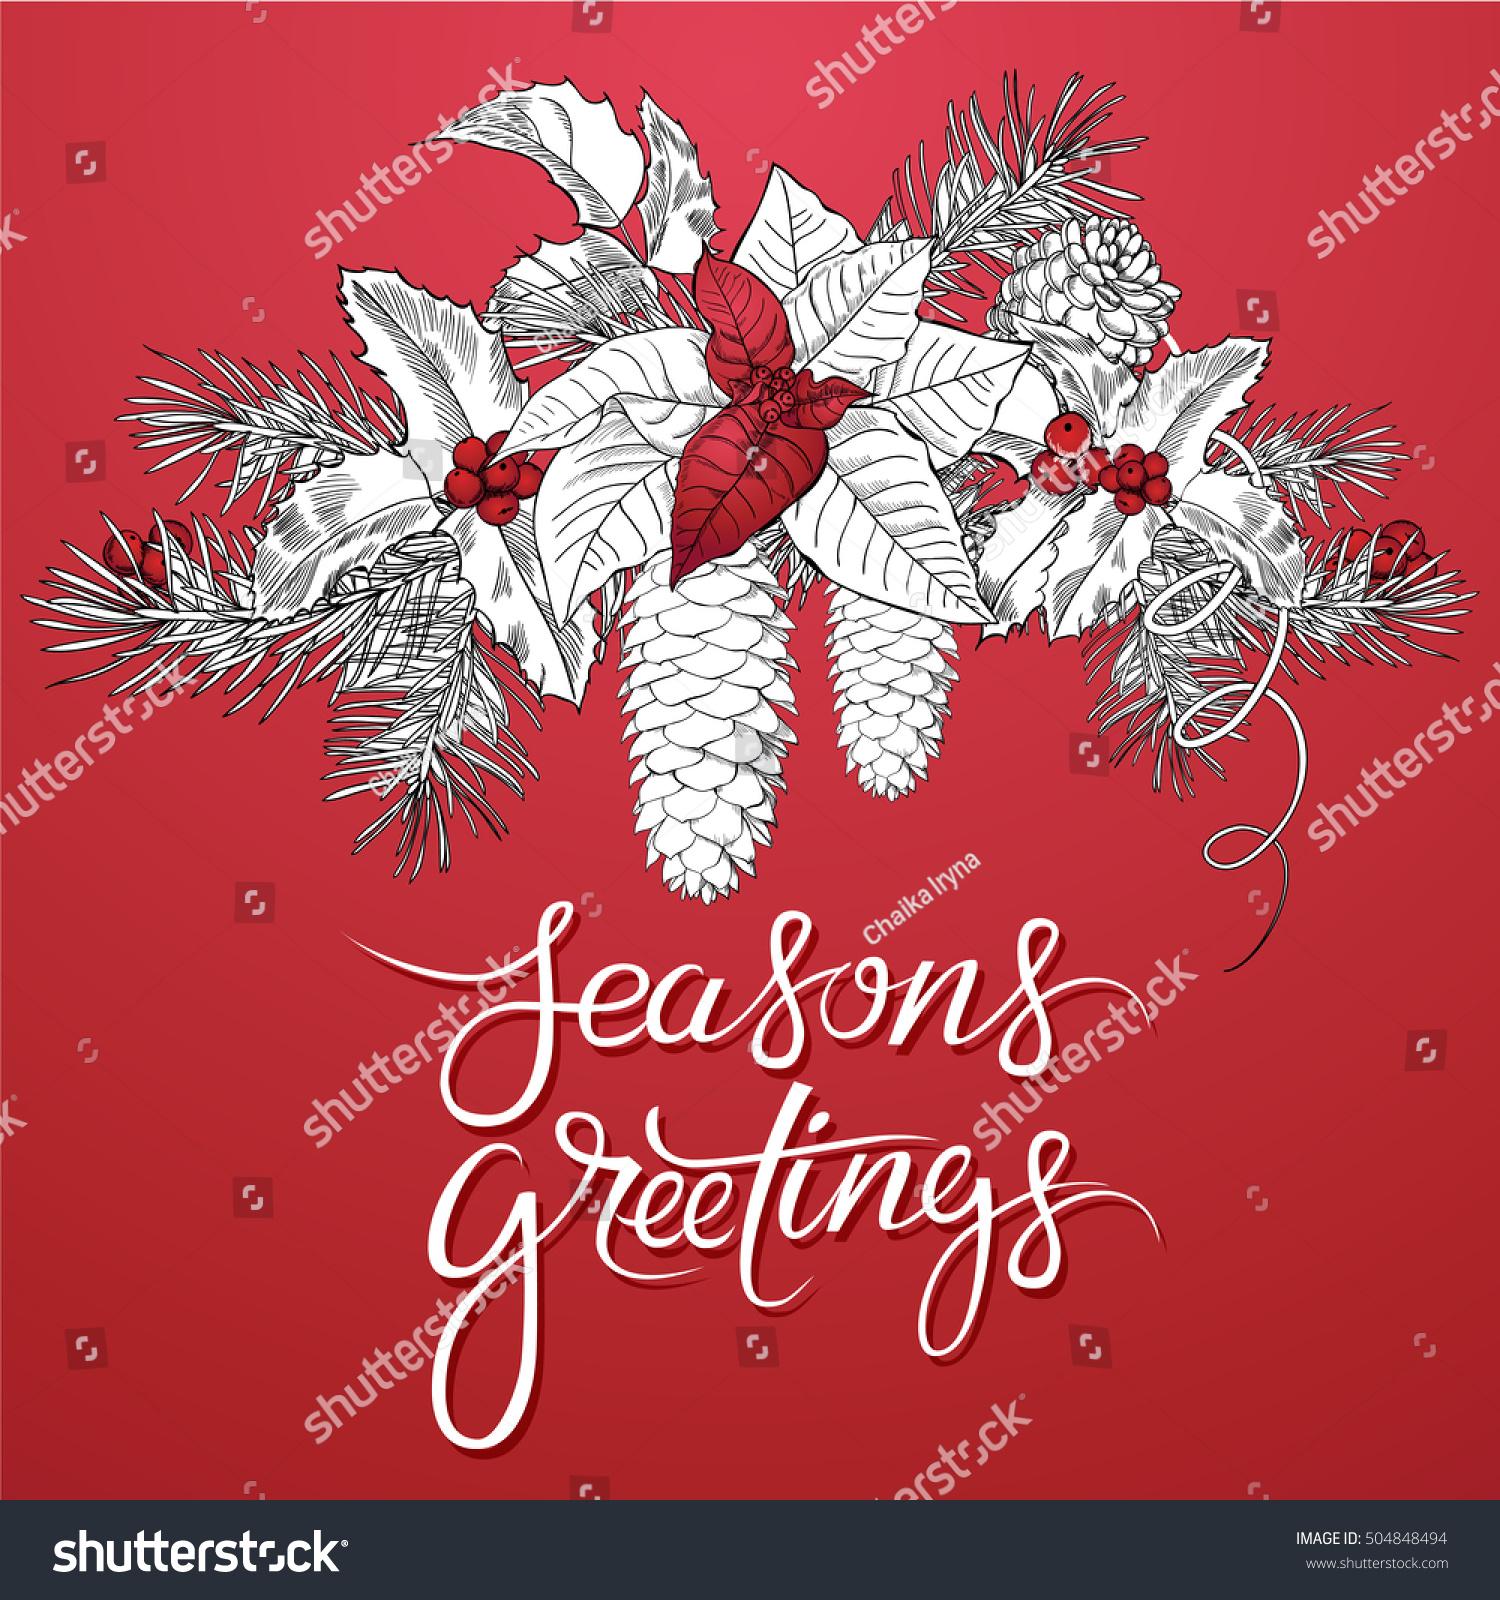 Seasons Greetings Seasonal Vector Hand Drawn Lettering Stock Vector